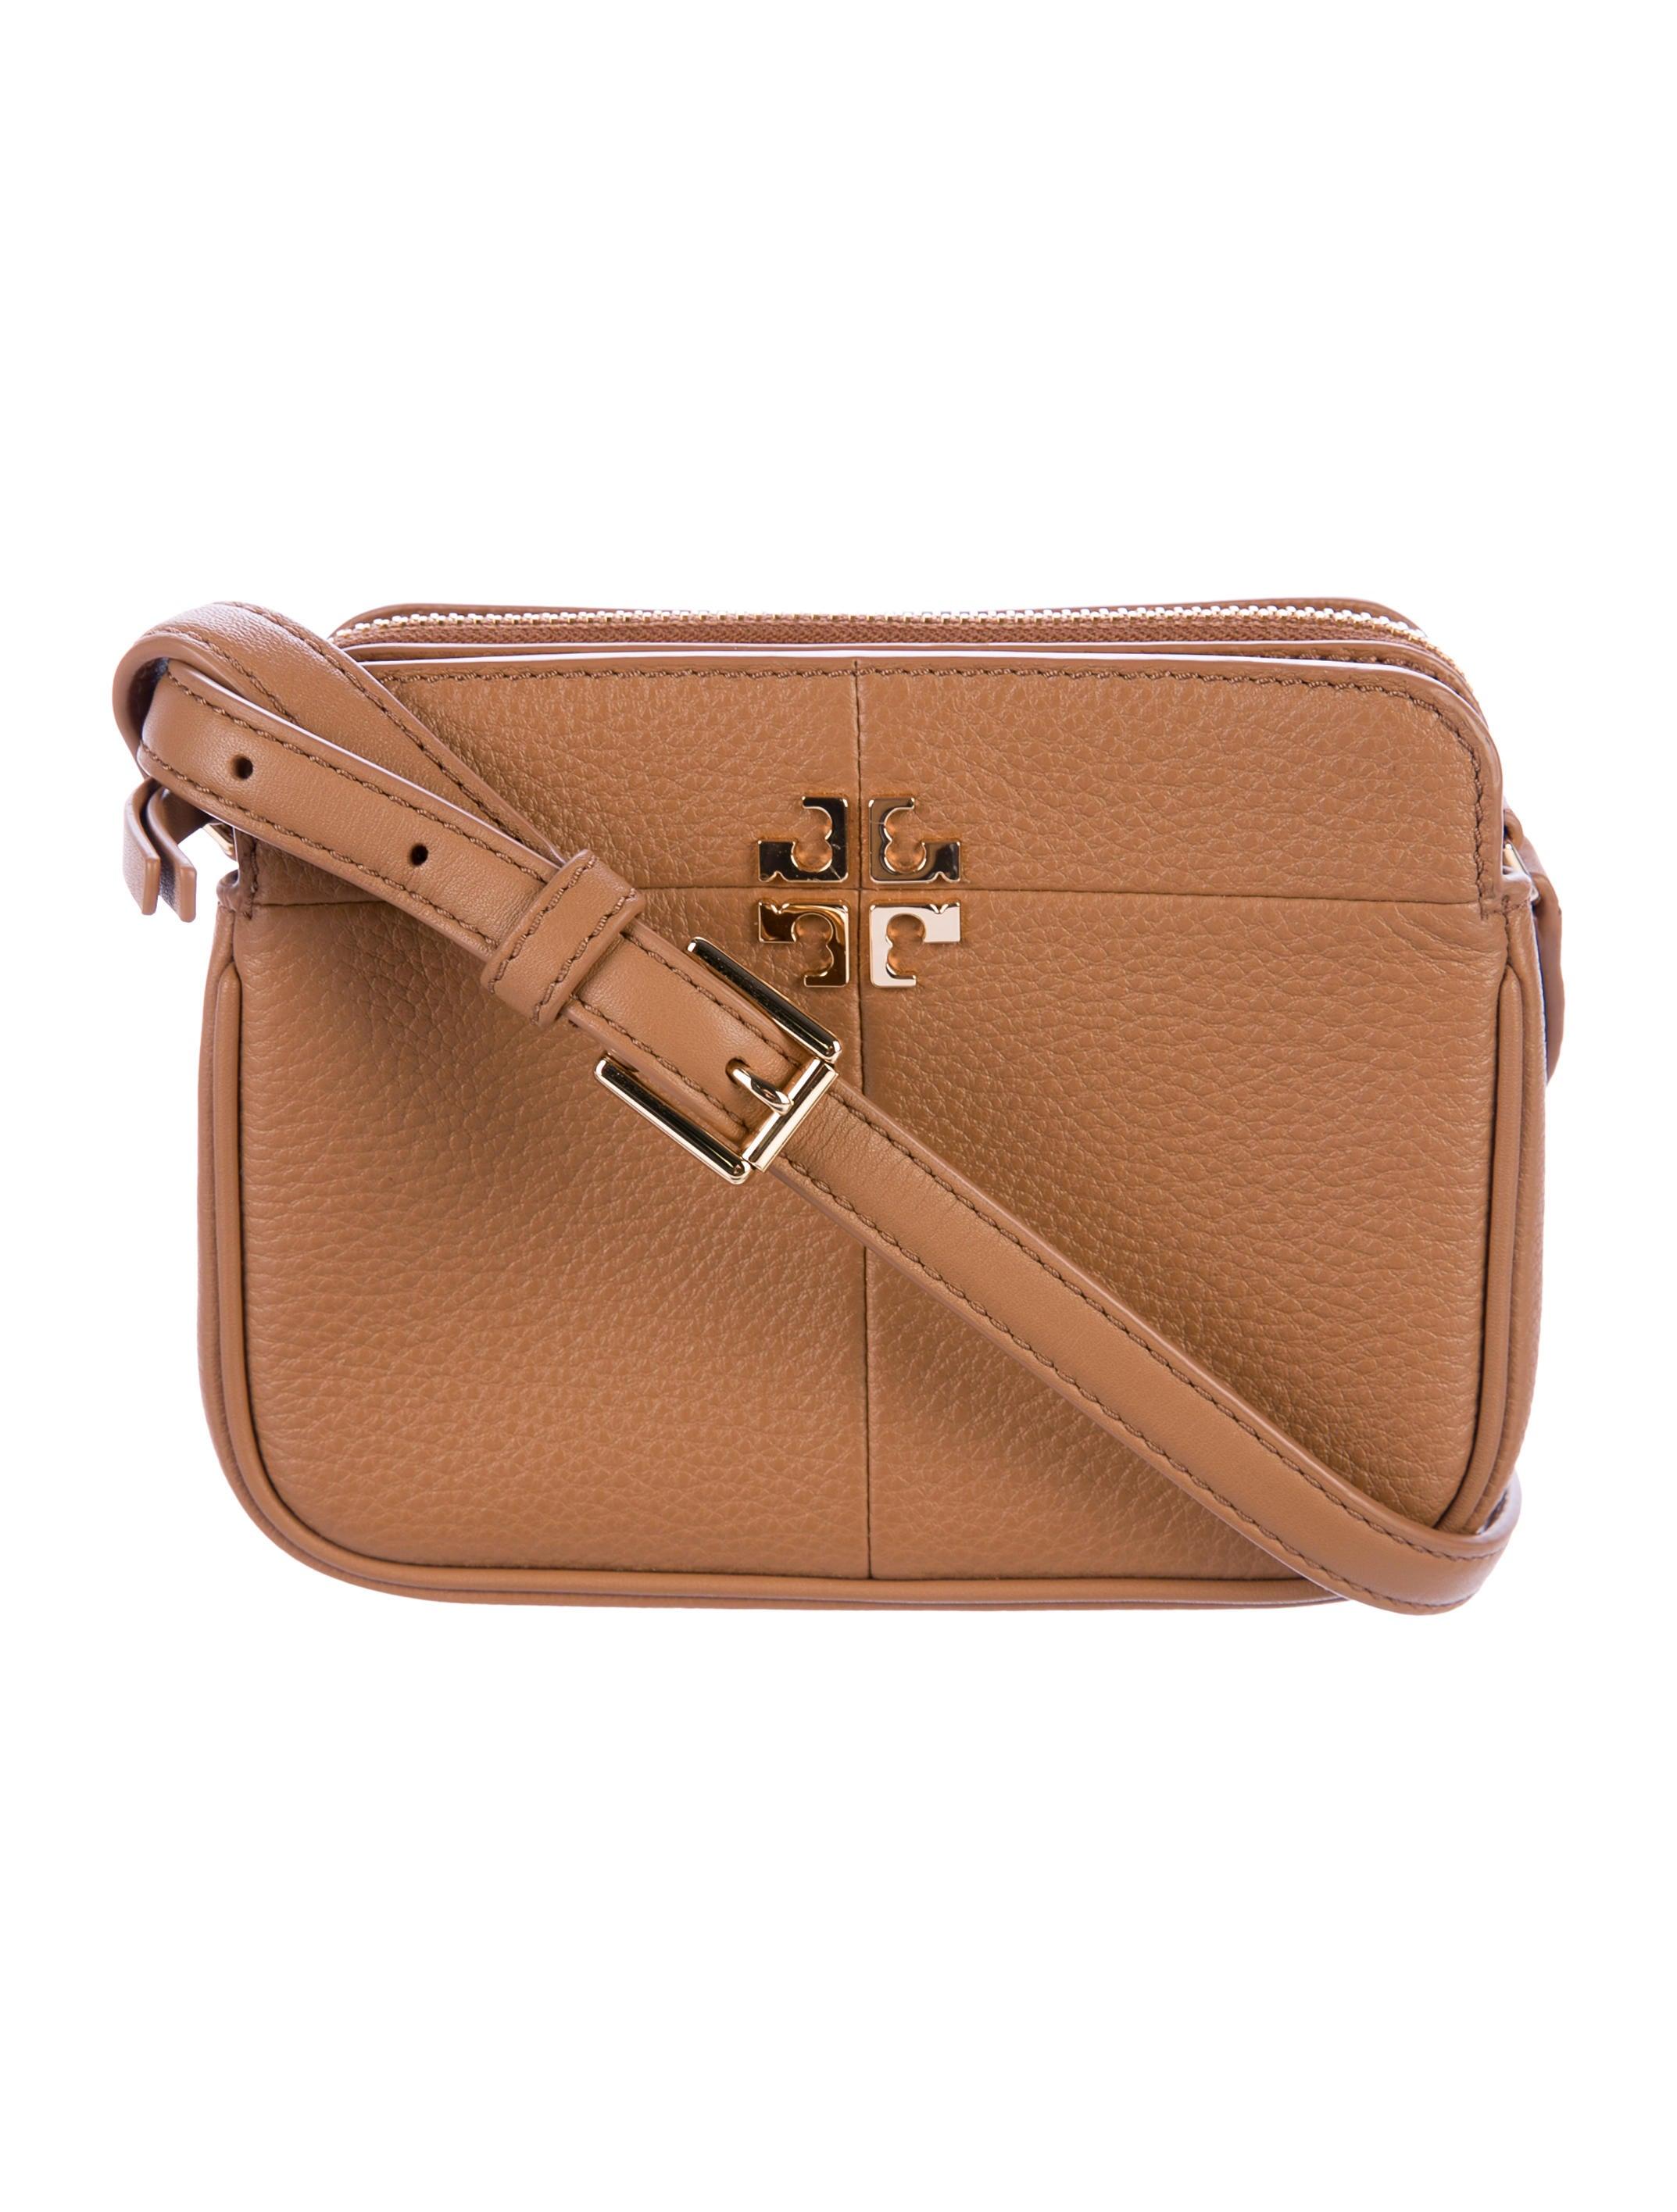 3c470e73872 Tory Burch Ivy Micro Crossbody Bag w  Tags - Handbags - WTO115744 ...